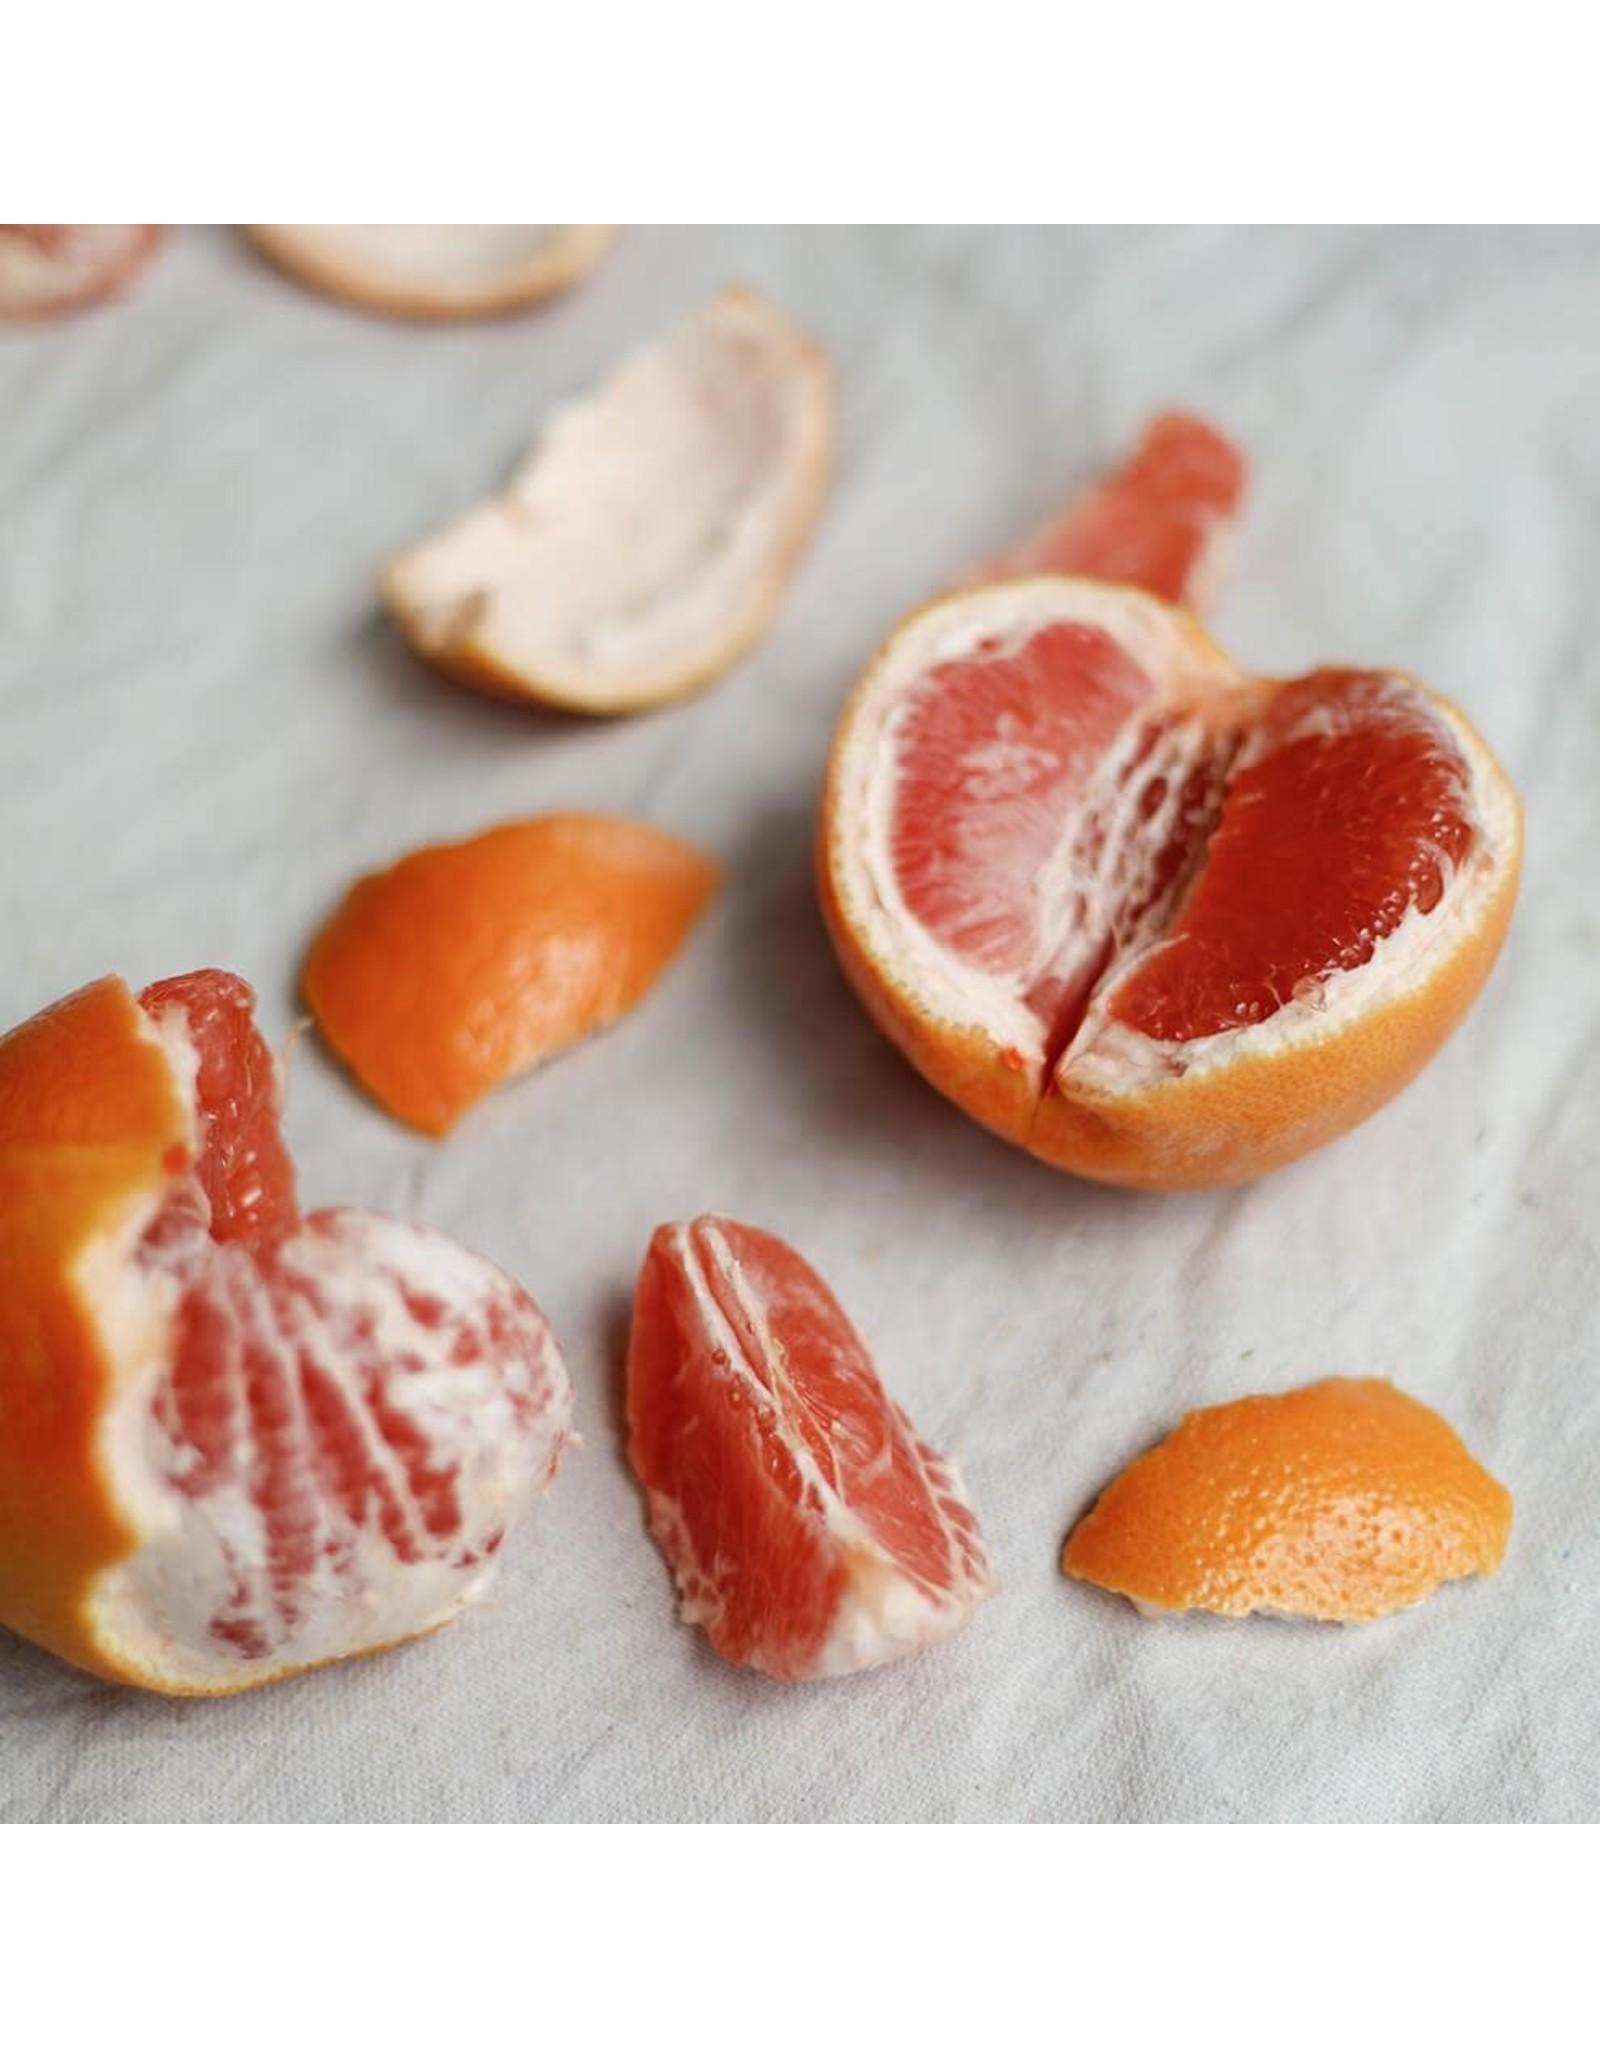 Vitruvi Vitruvi Pink Grapefruit Essential Oil